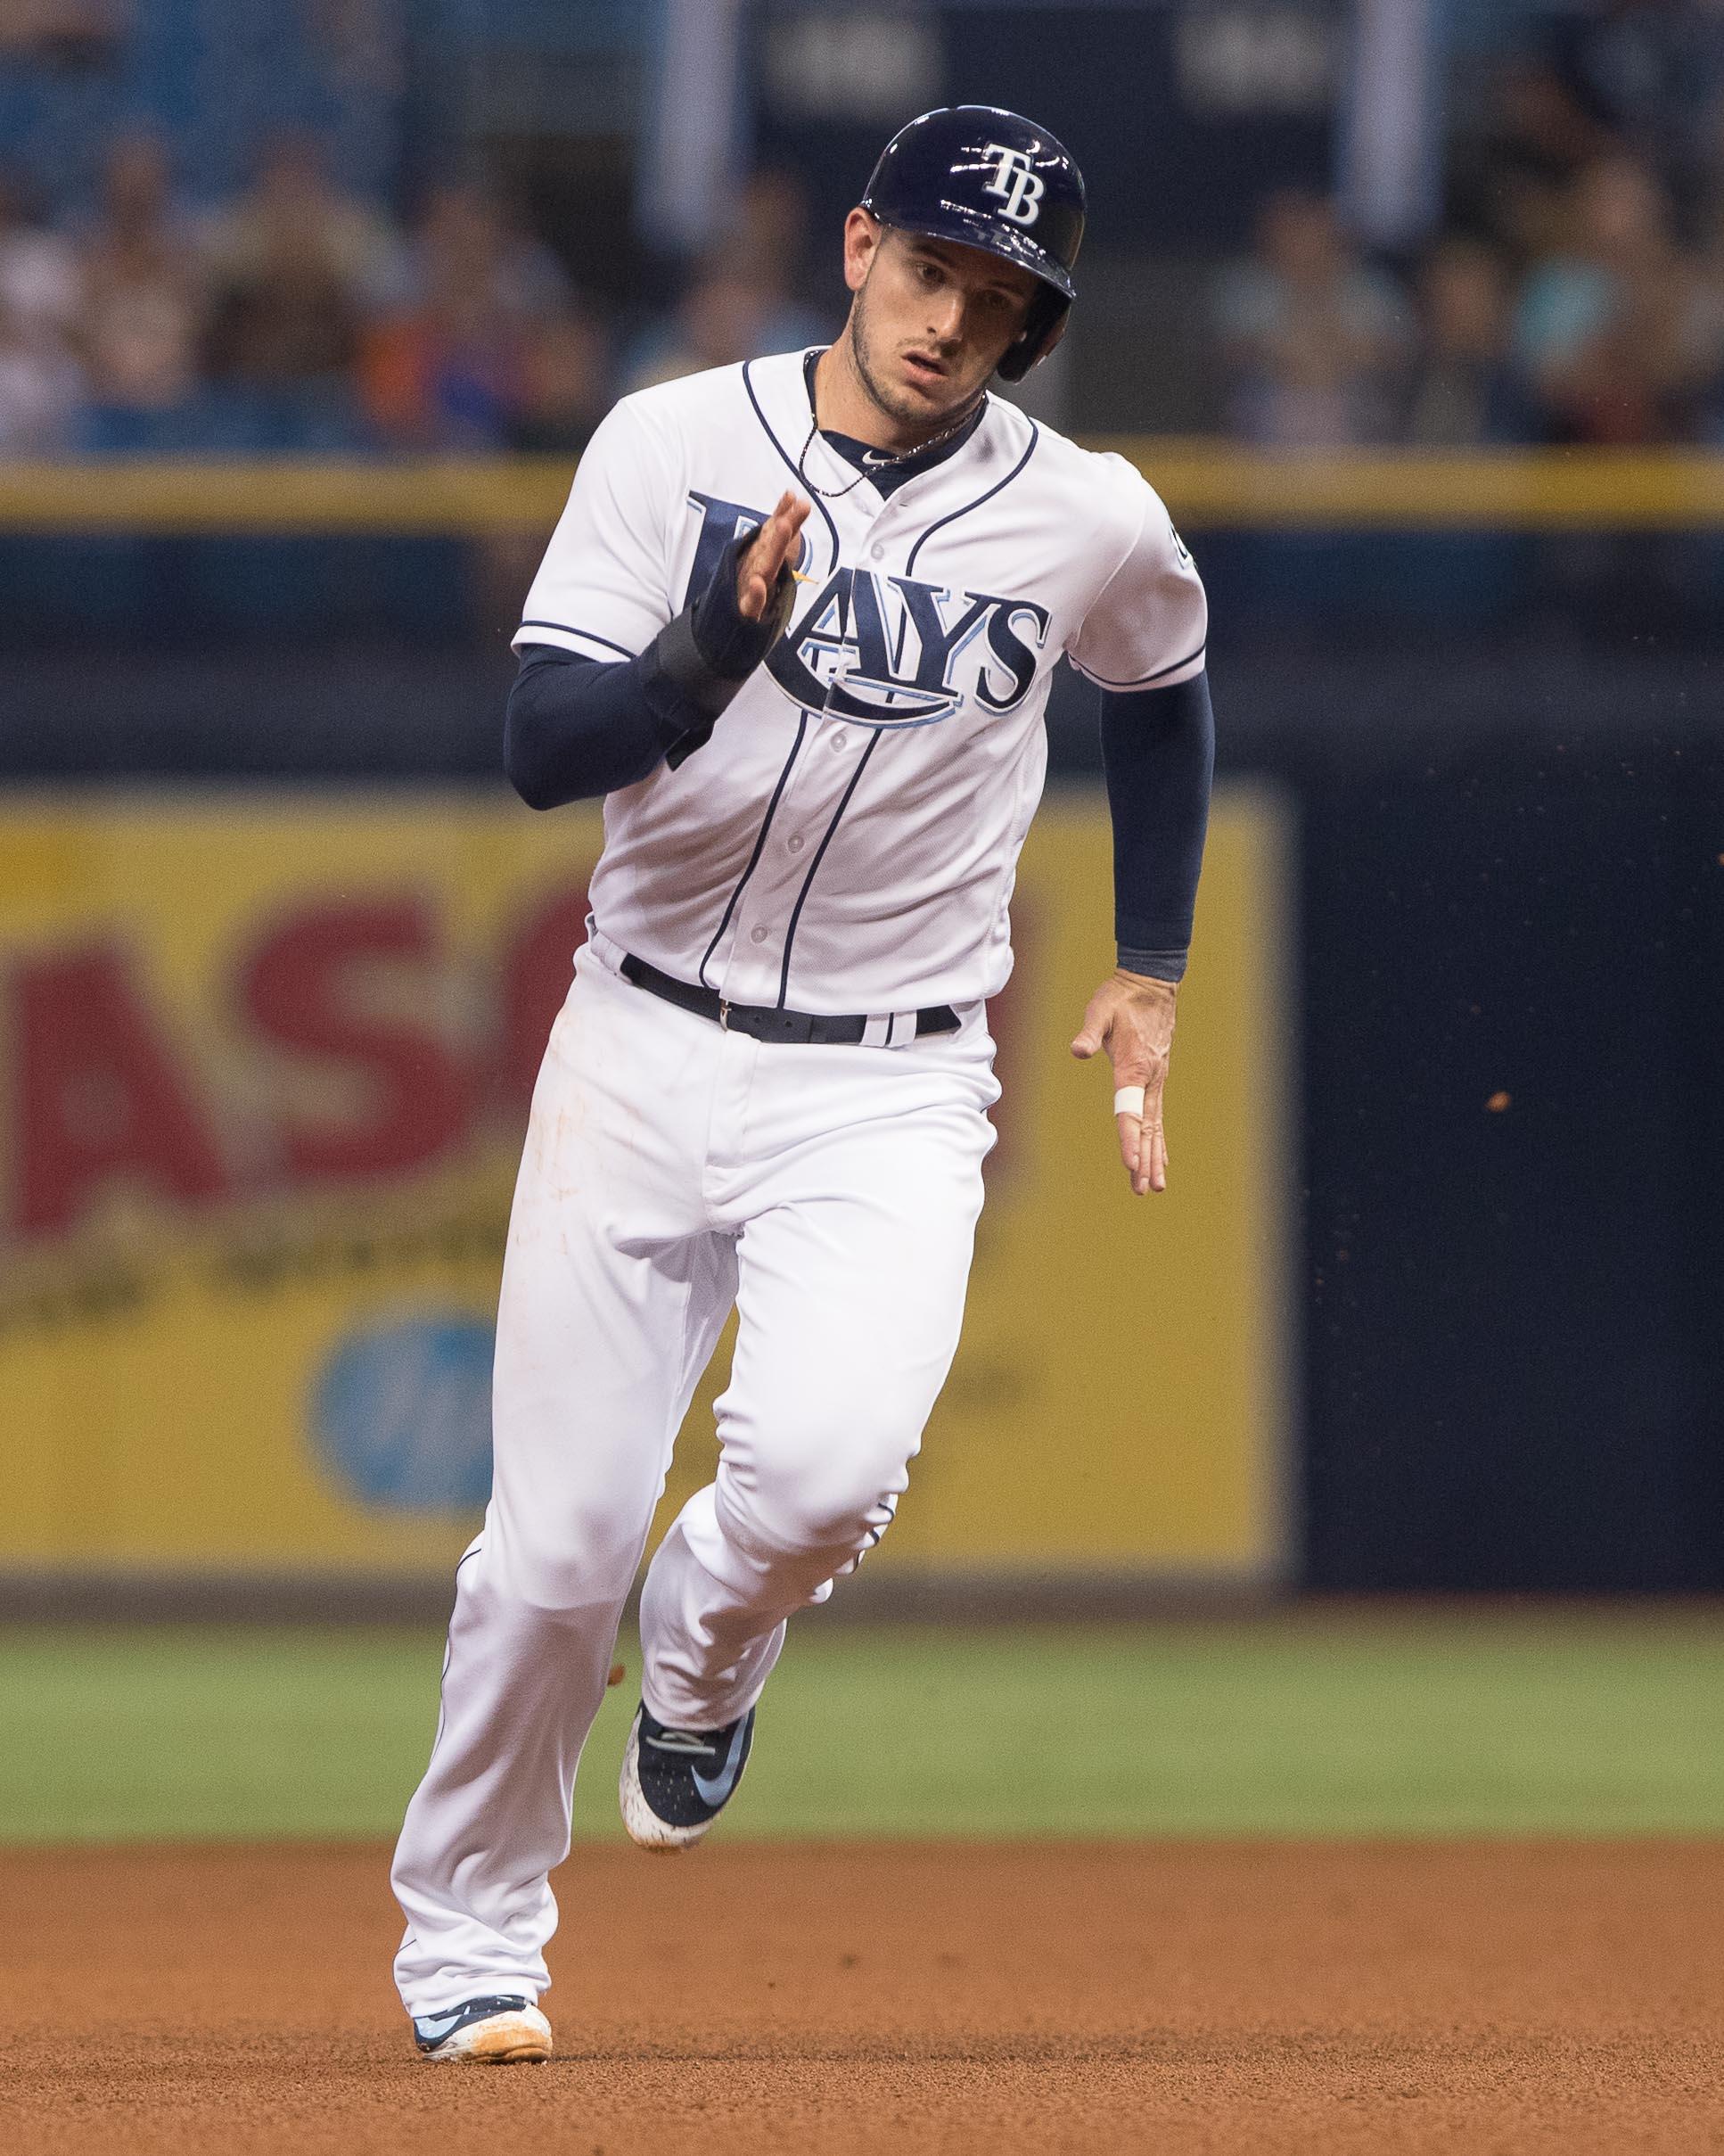 Daniel Robertson runs to 3rd base./STEVEN MUNICE